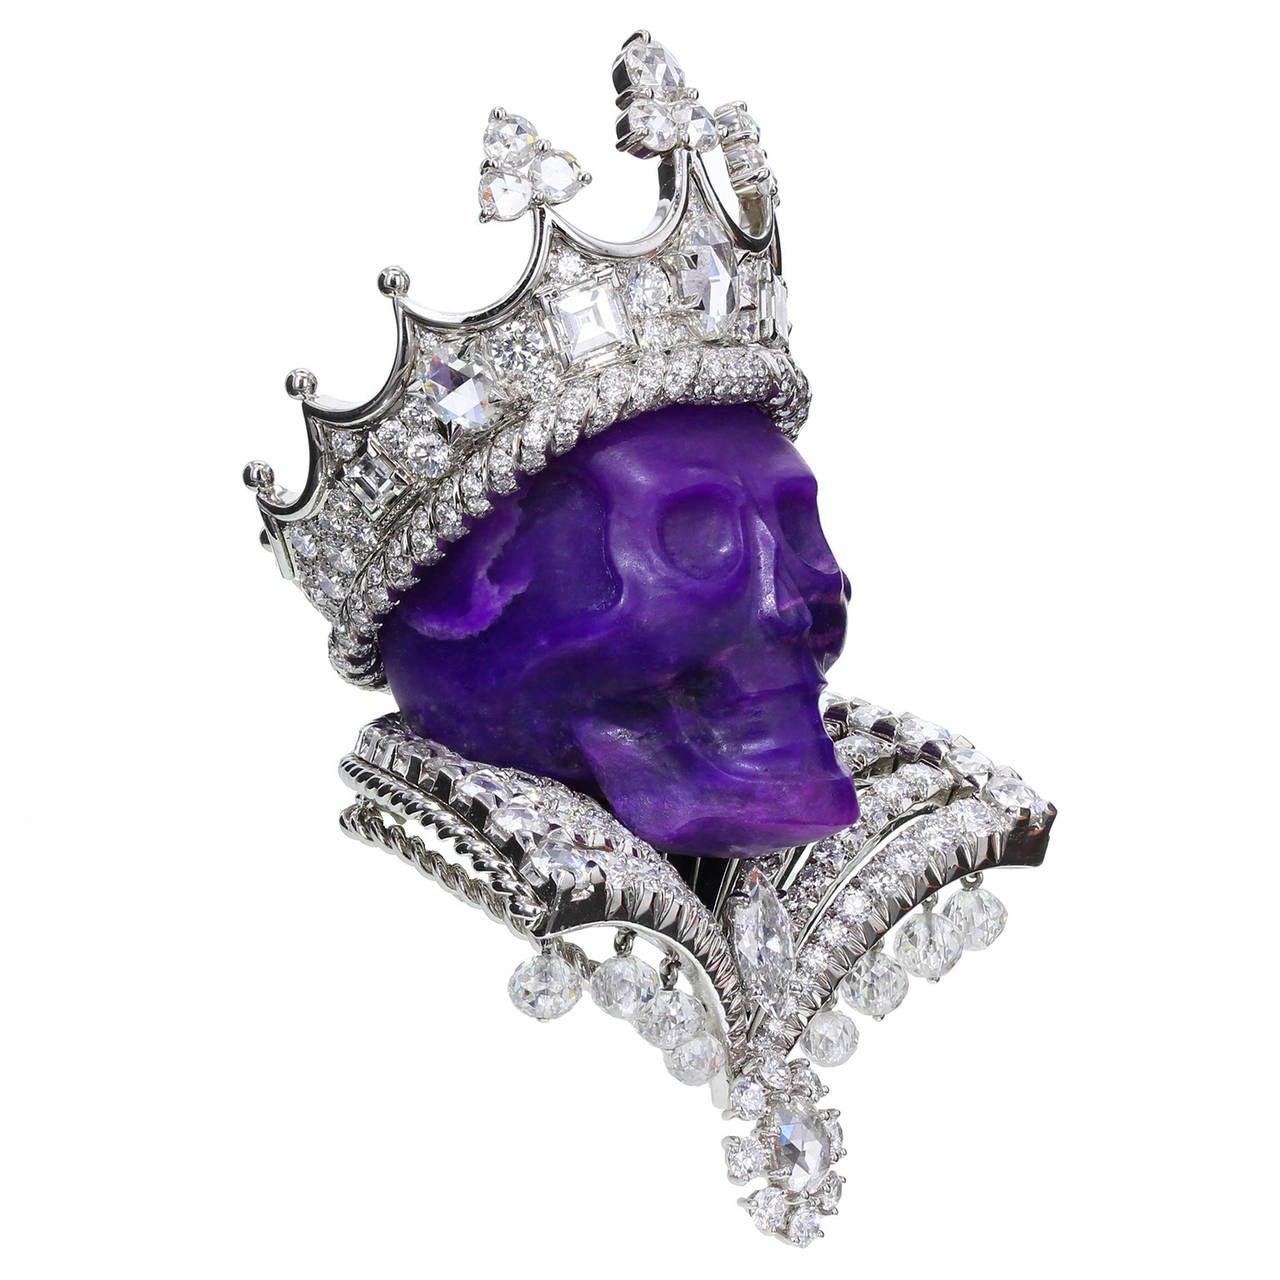 Dior Joaillerie Victoire de Castellane Kings and Queens Roi de Sugilite Pendant 3